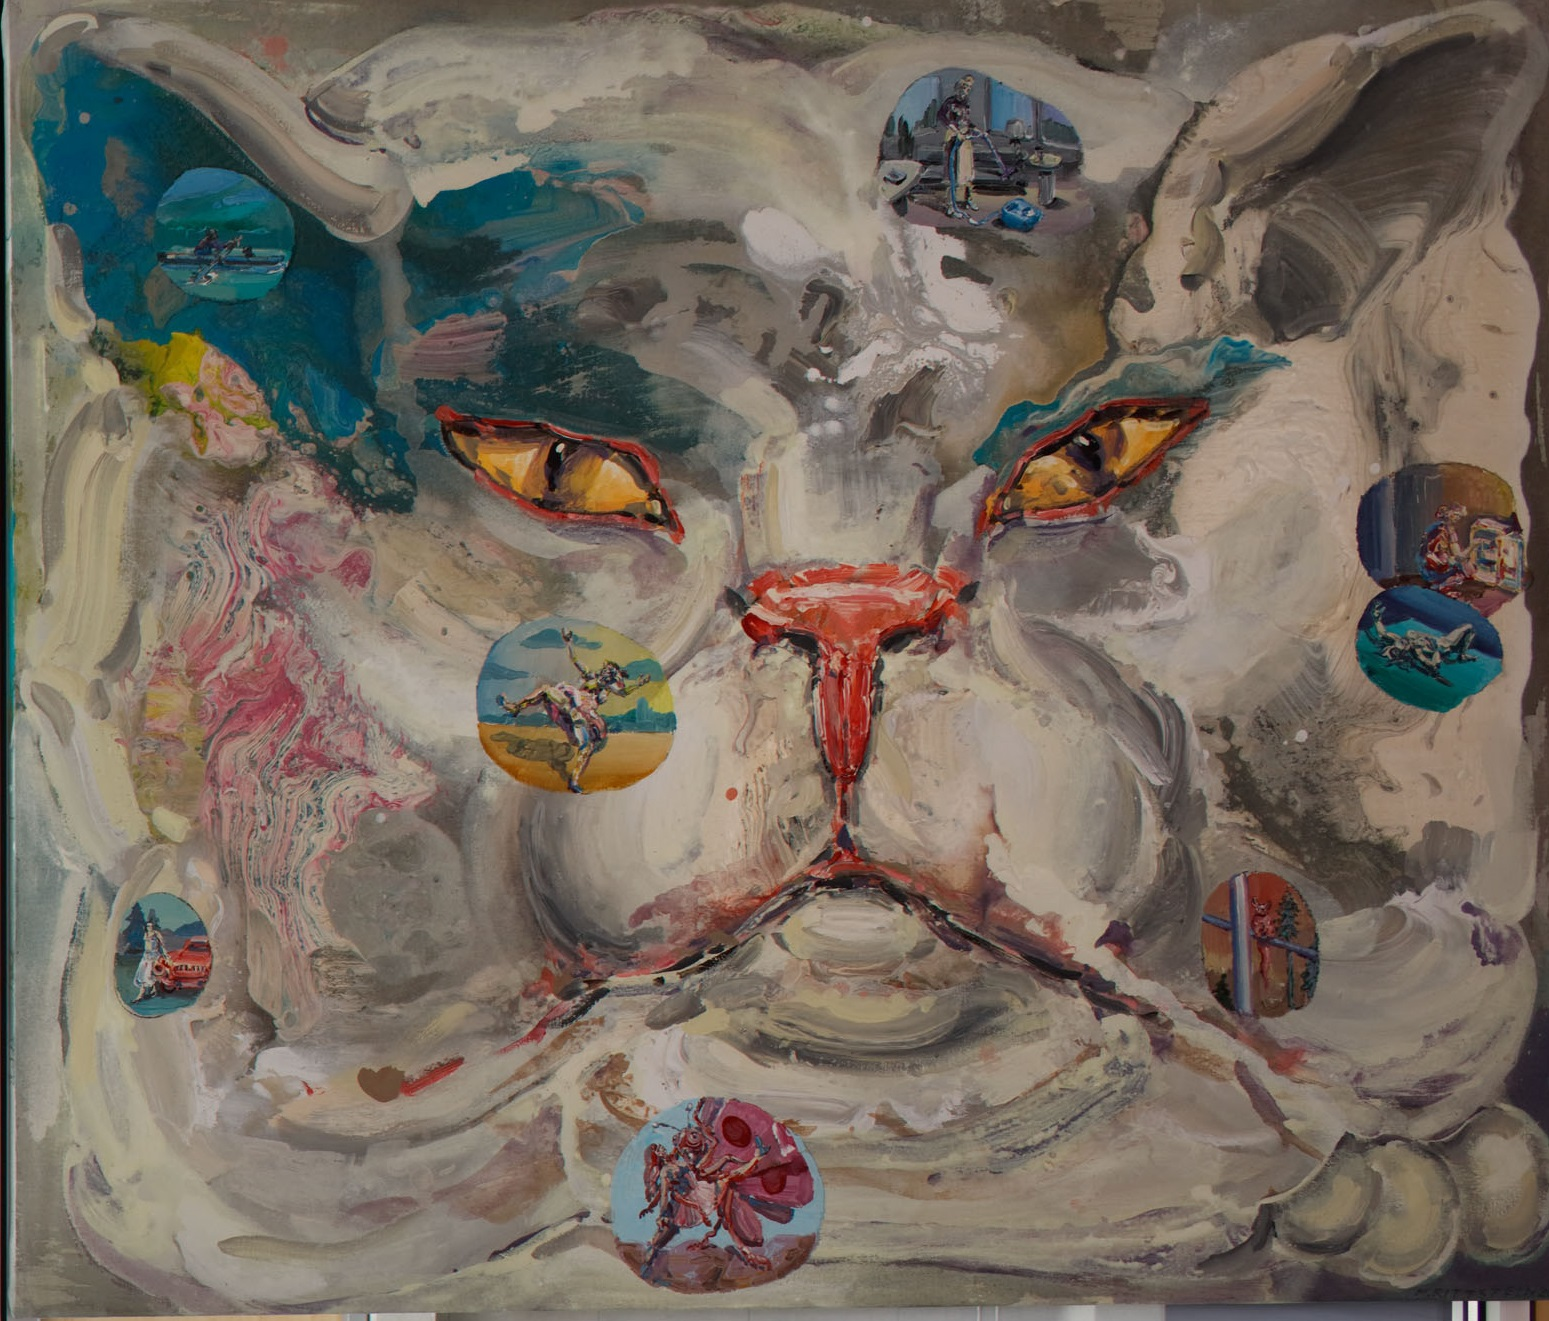 Michael Rittstein, Nestačí se divit, 2016, plátno, akryl, 180 x 150 cm